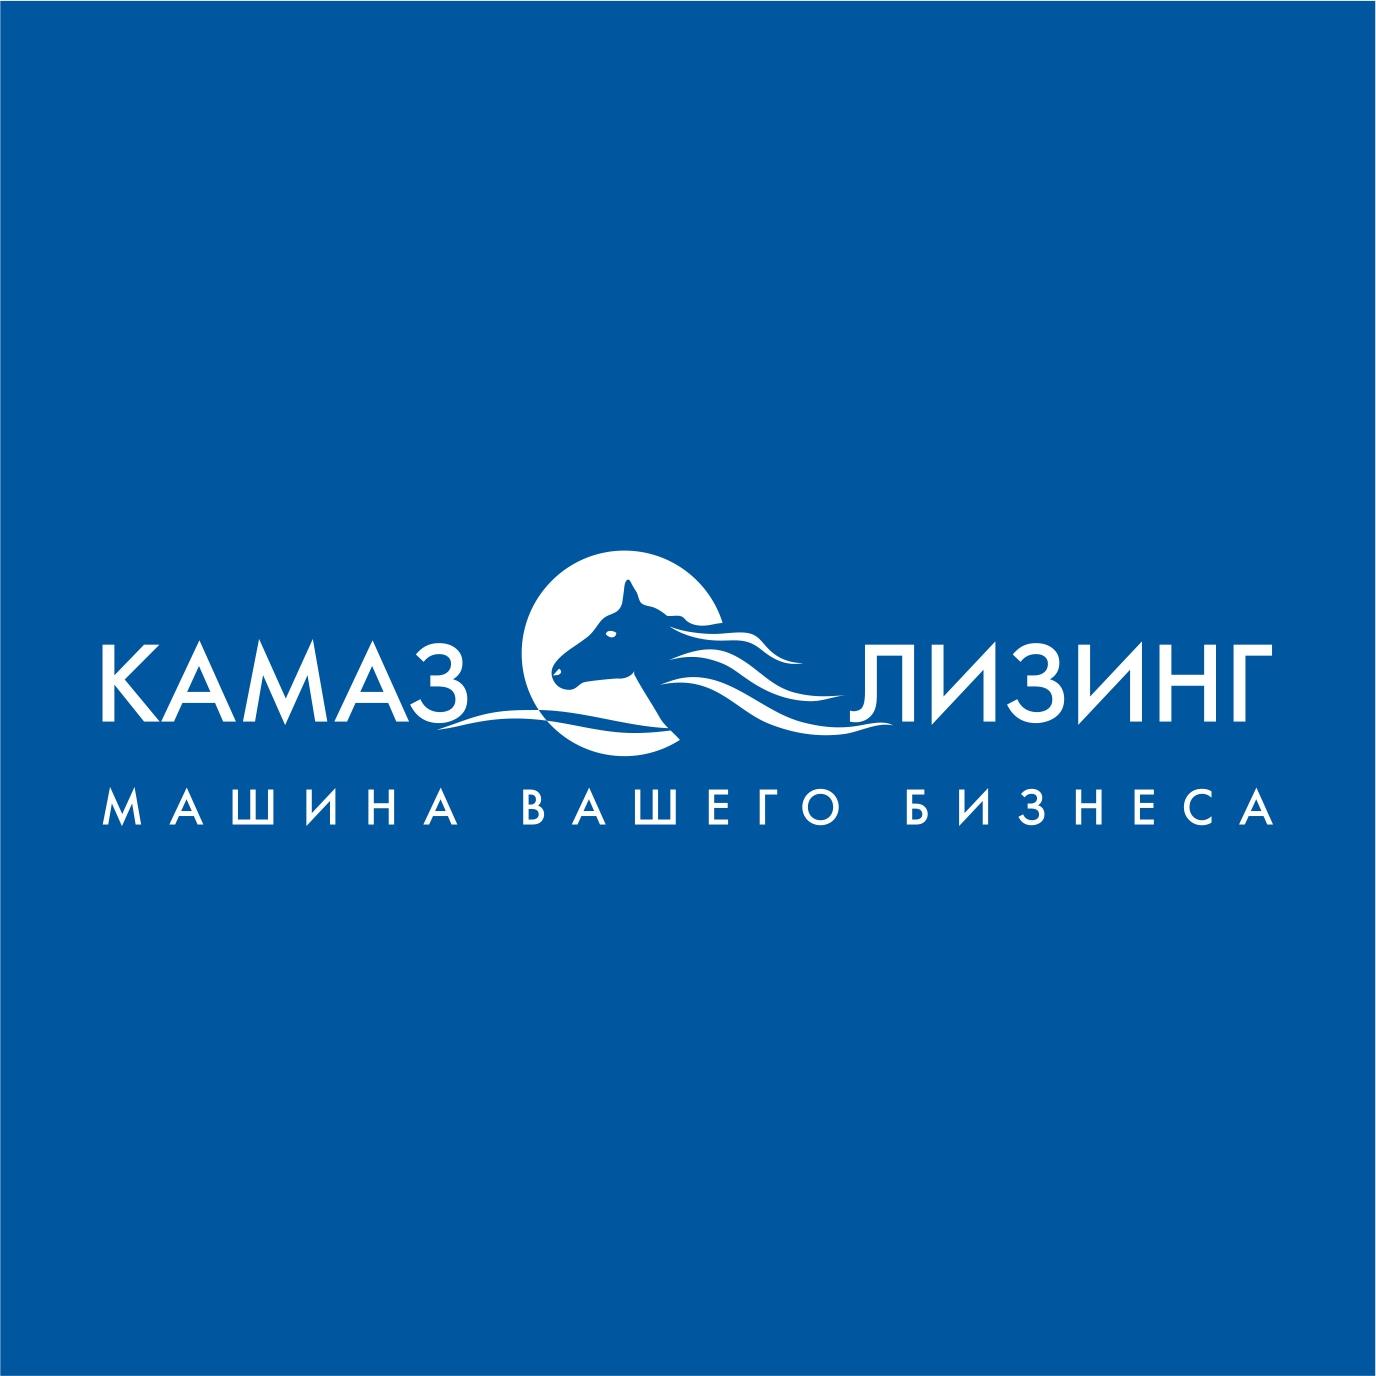 ТОП-3 продуктов от «КАМАЗ-ЛИЗИНГа» в 2019 году